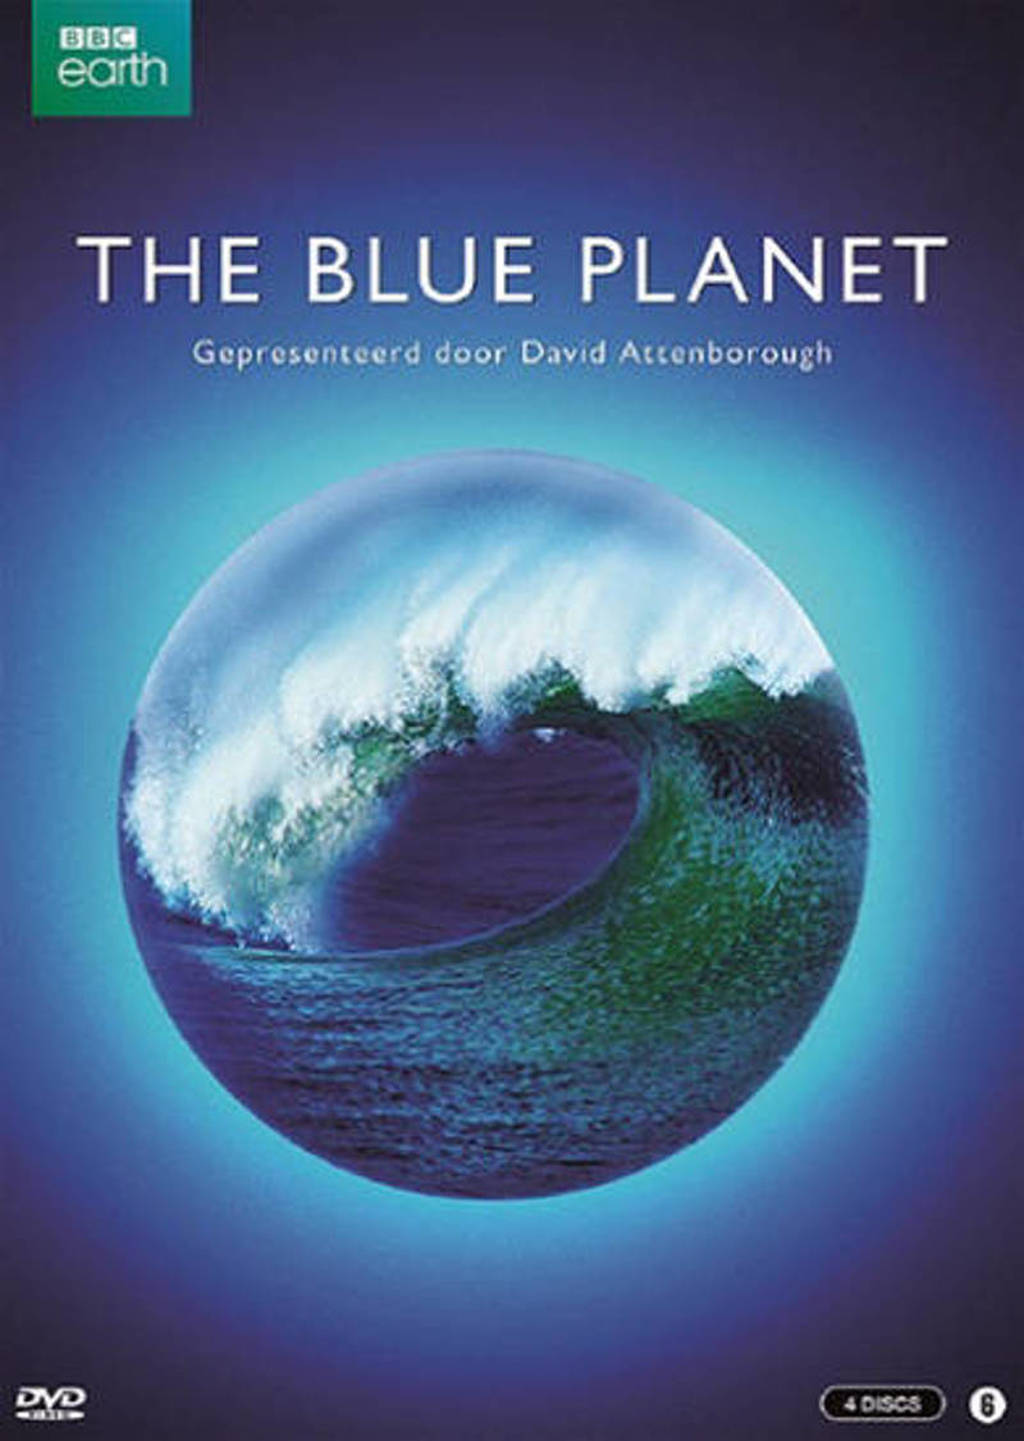 Blue planet 1 (DVD)